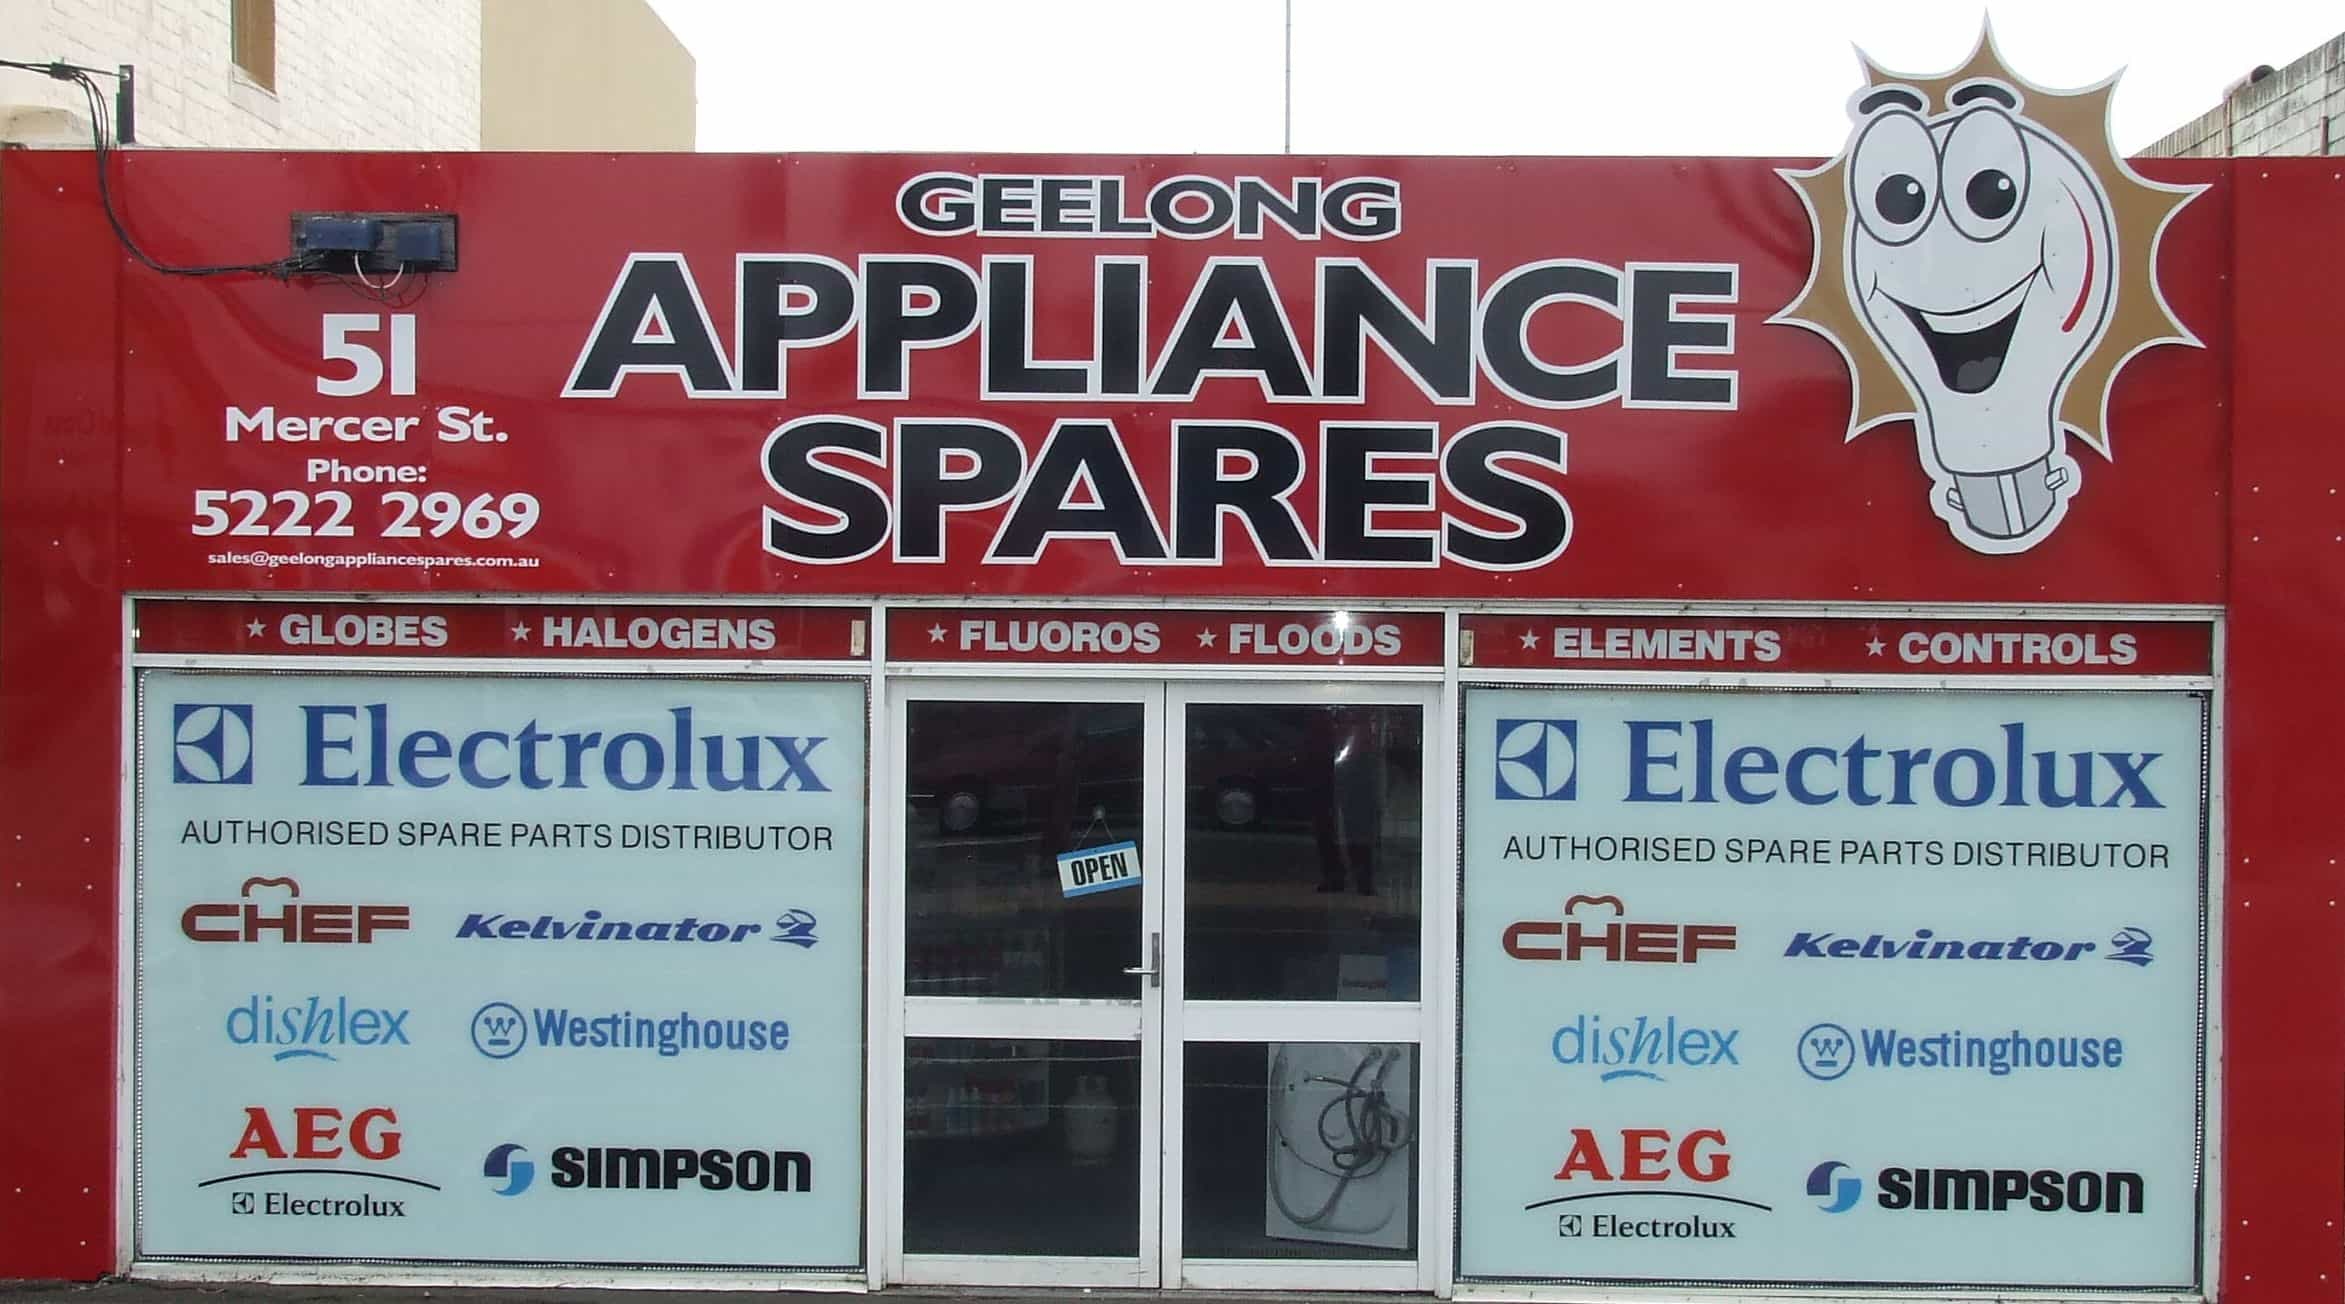 Geelong appliances spares